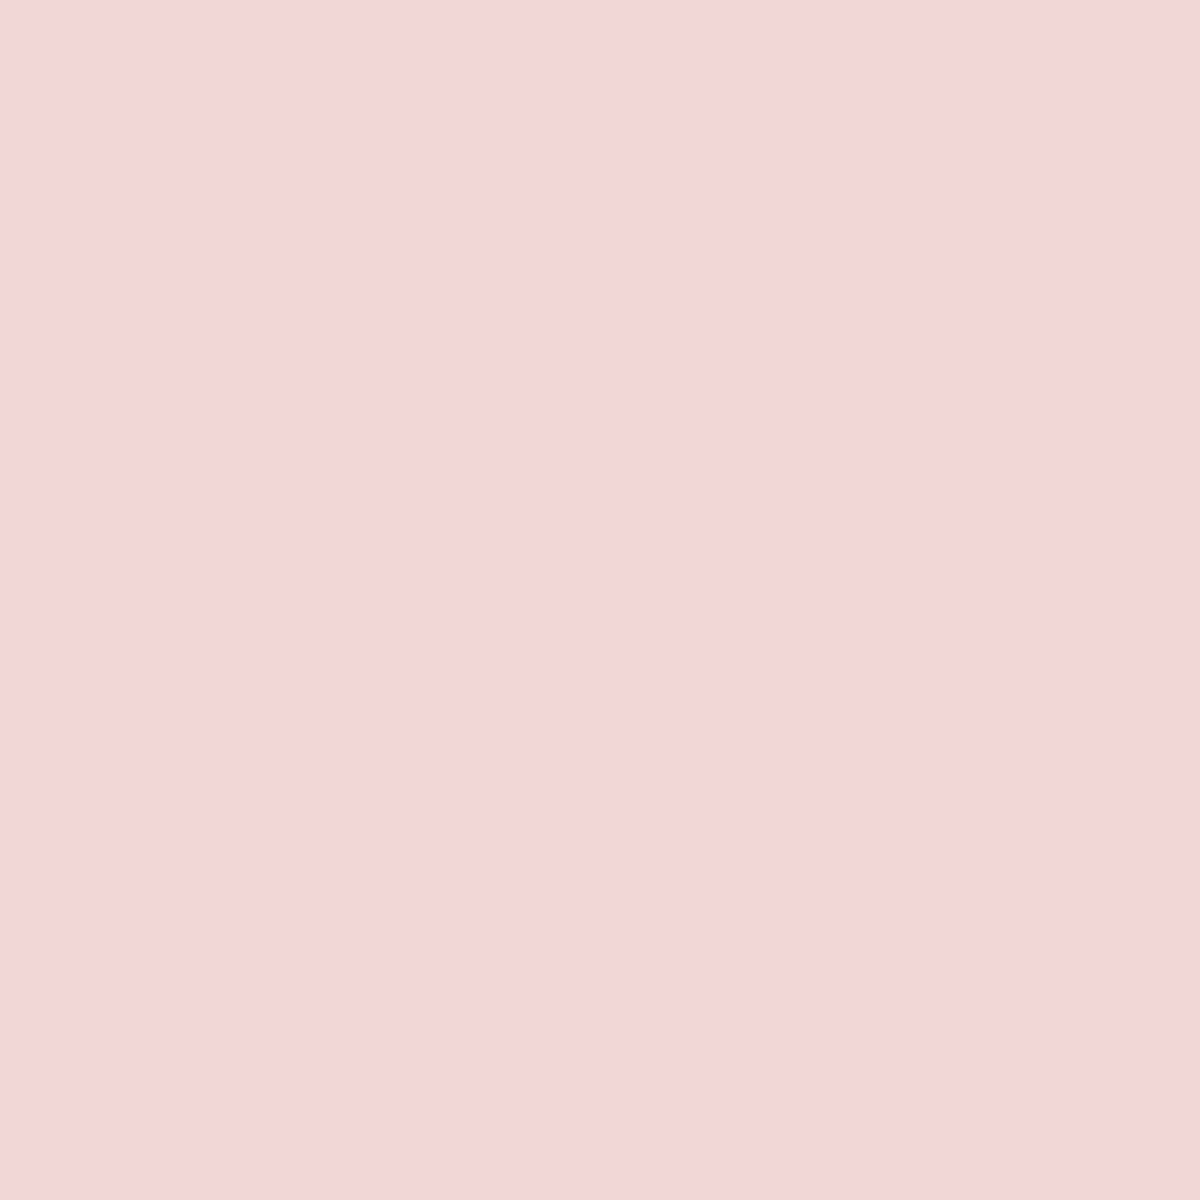 LY-KJ015粉蔷薇.jpg